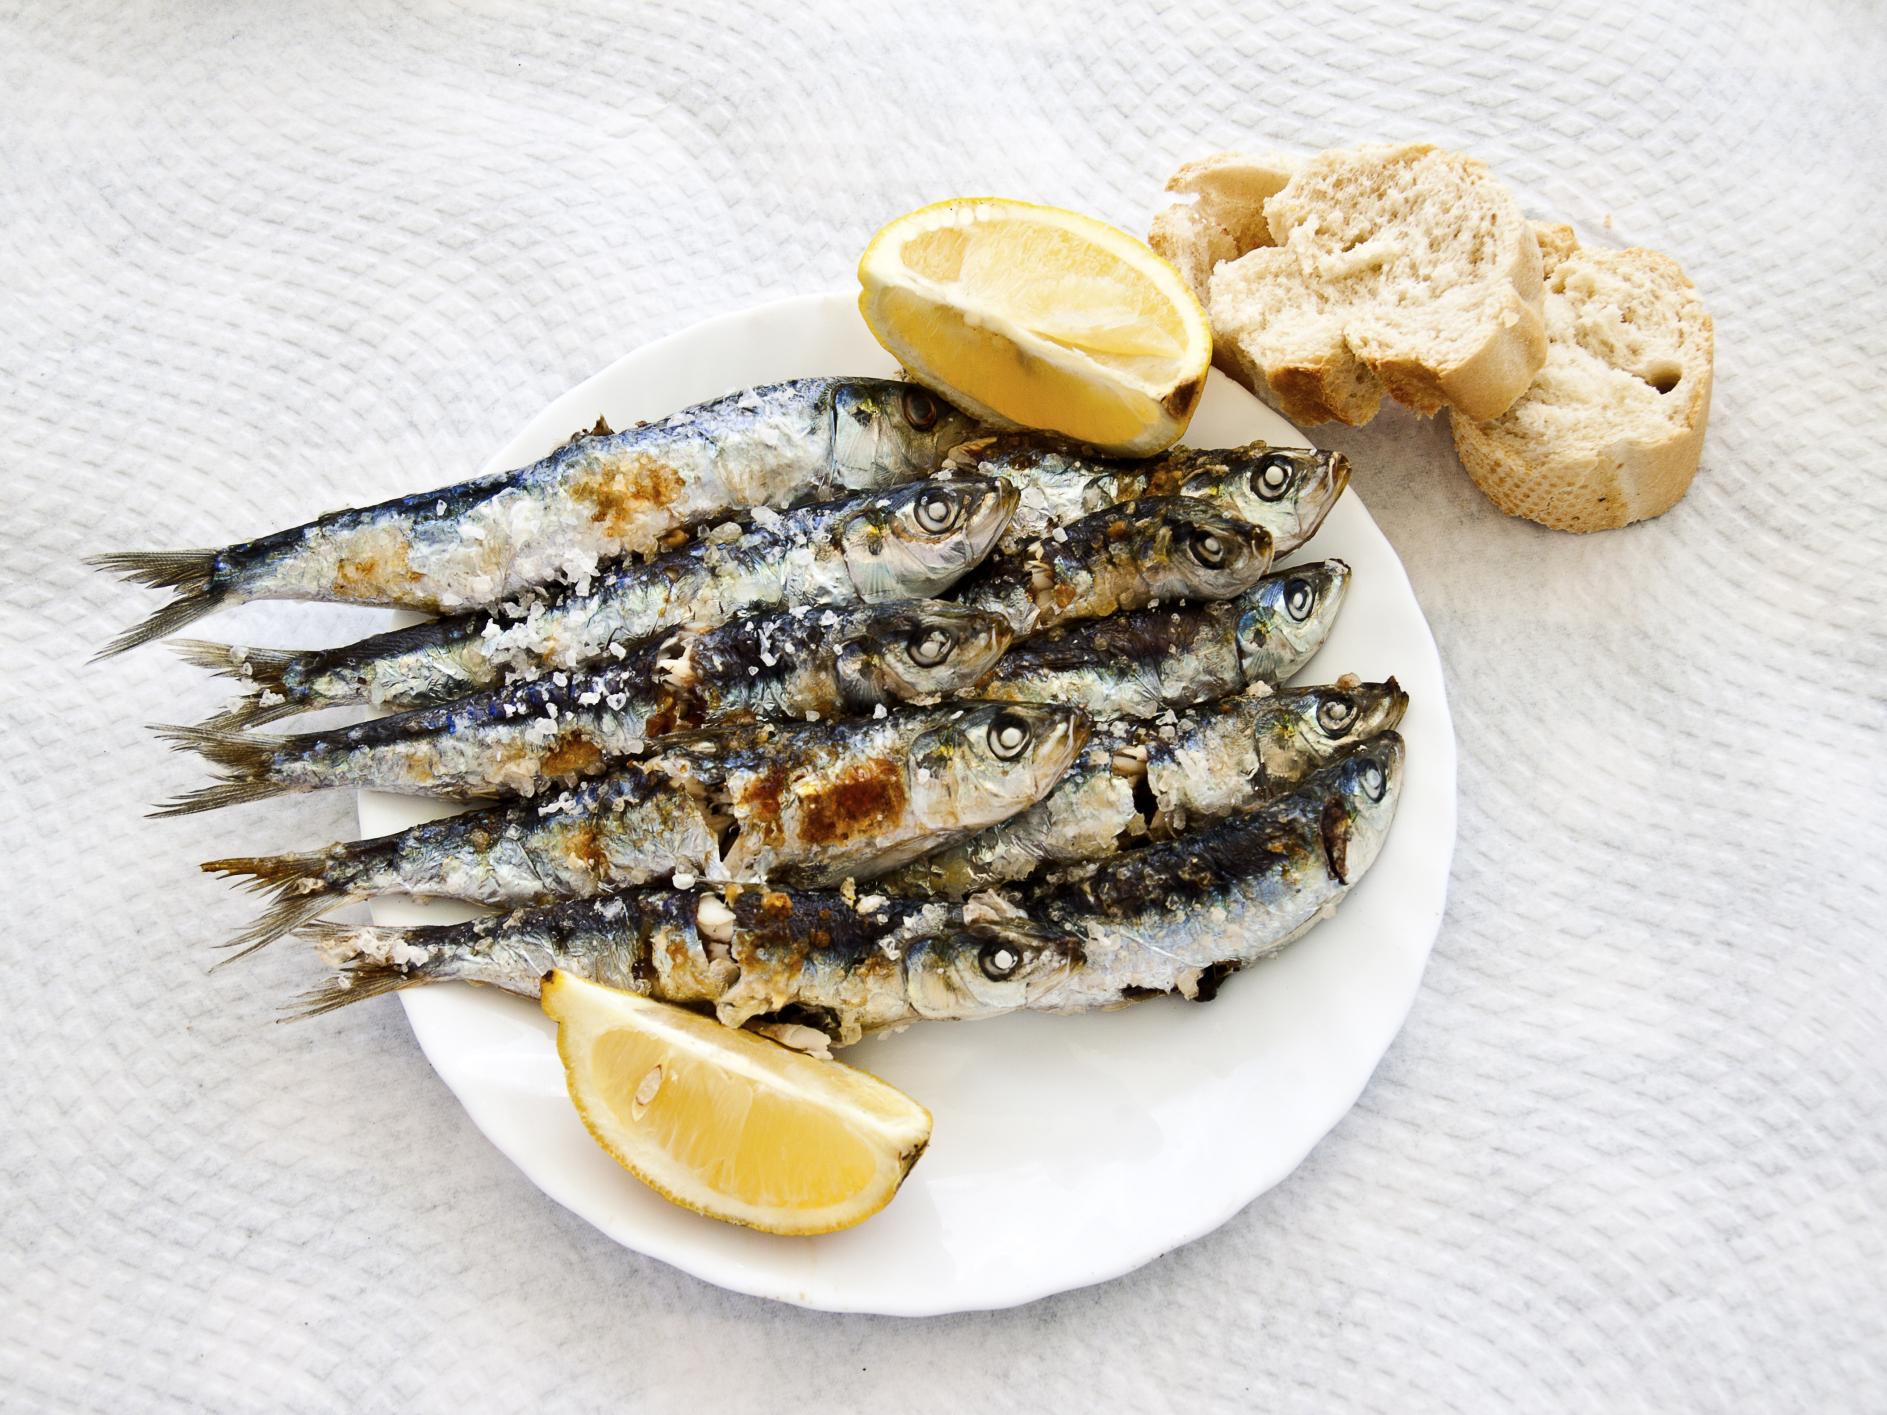 Sardines: A superfood for men